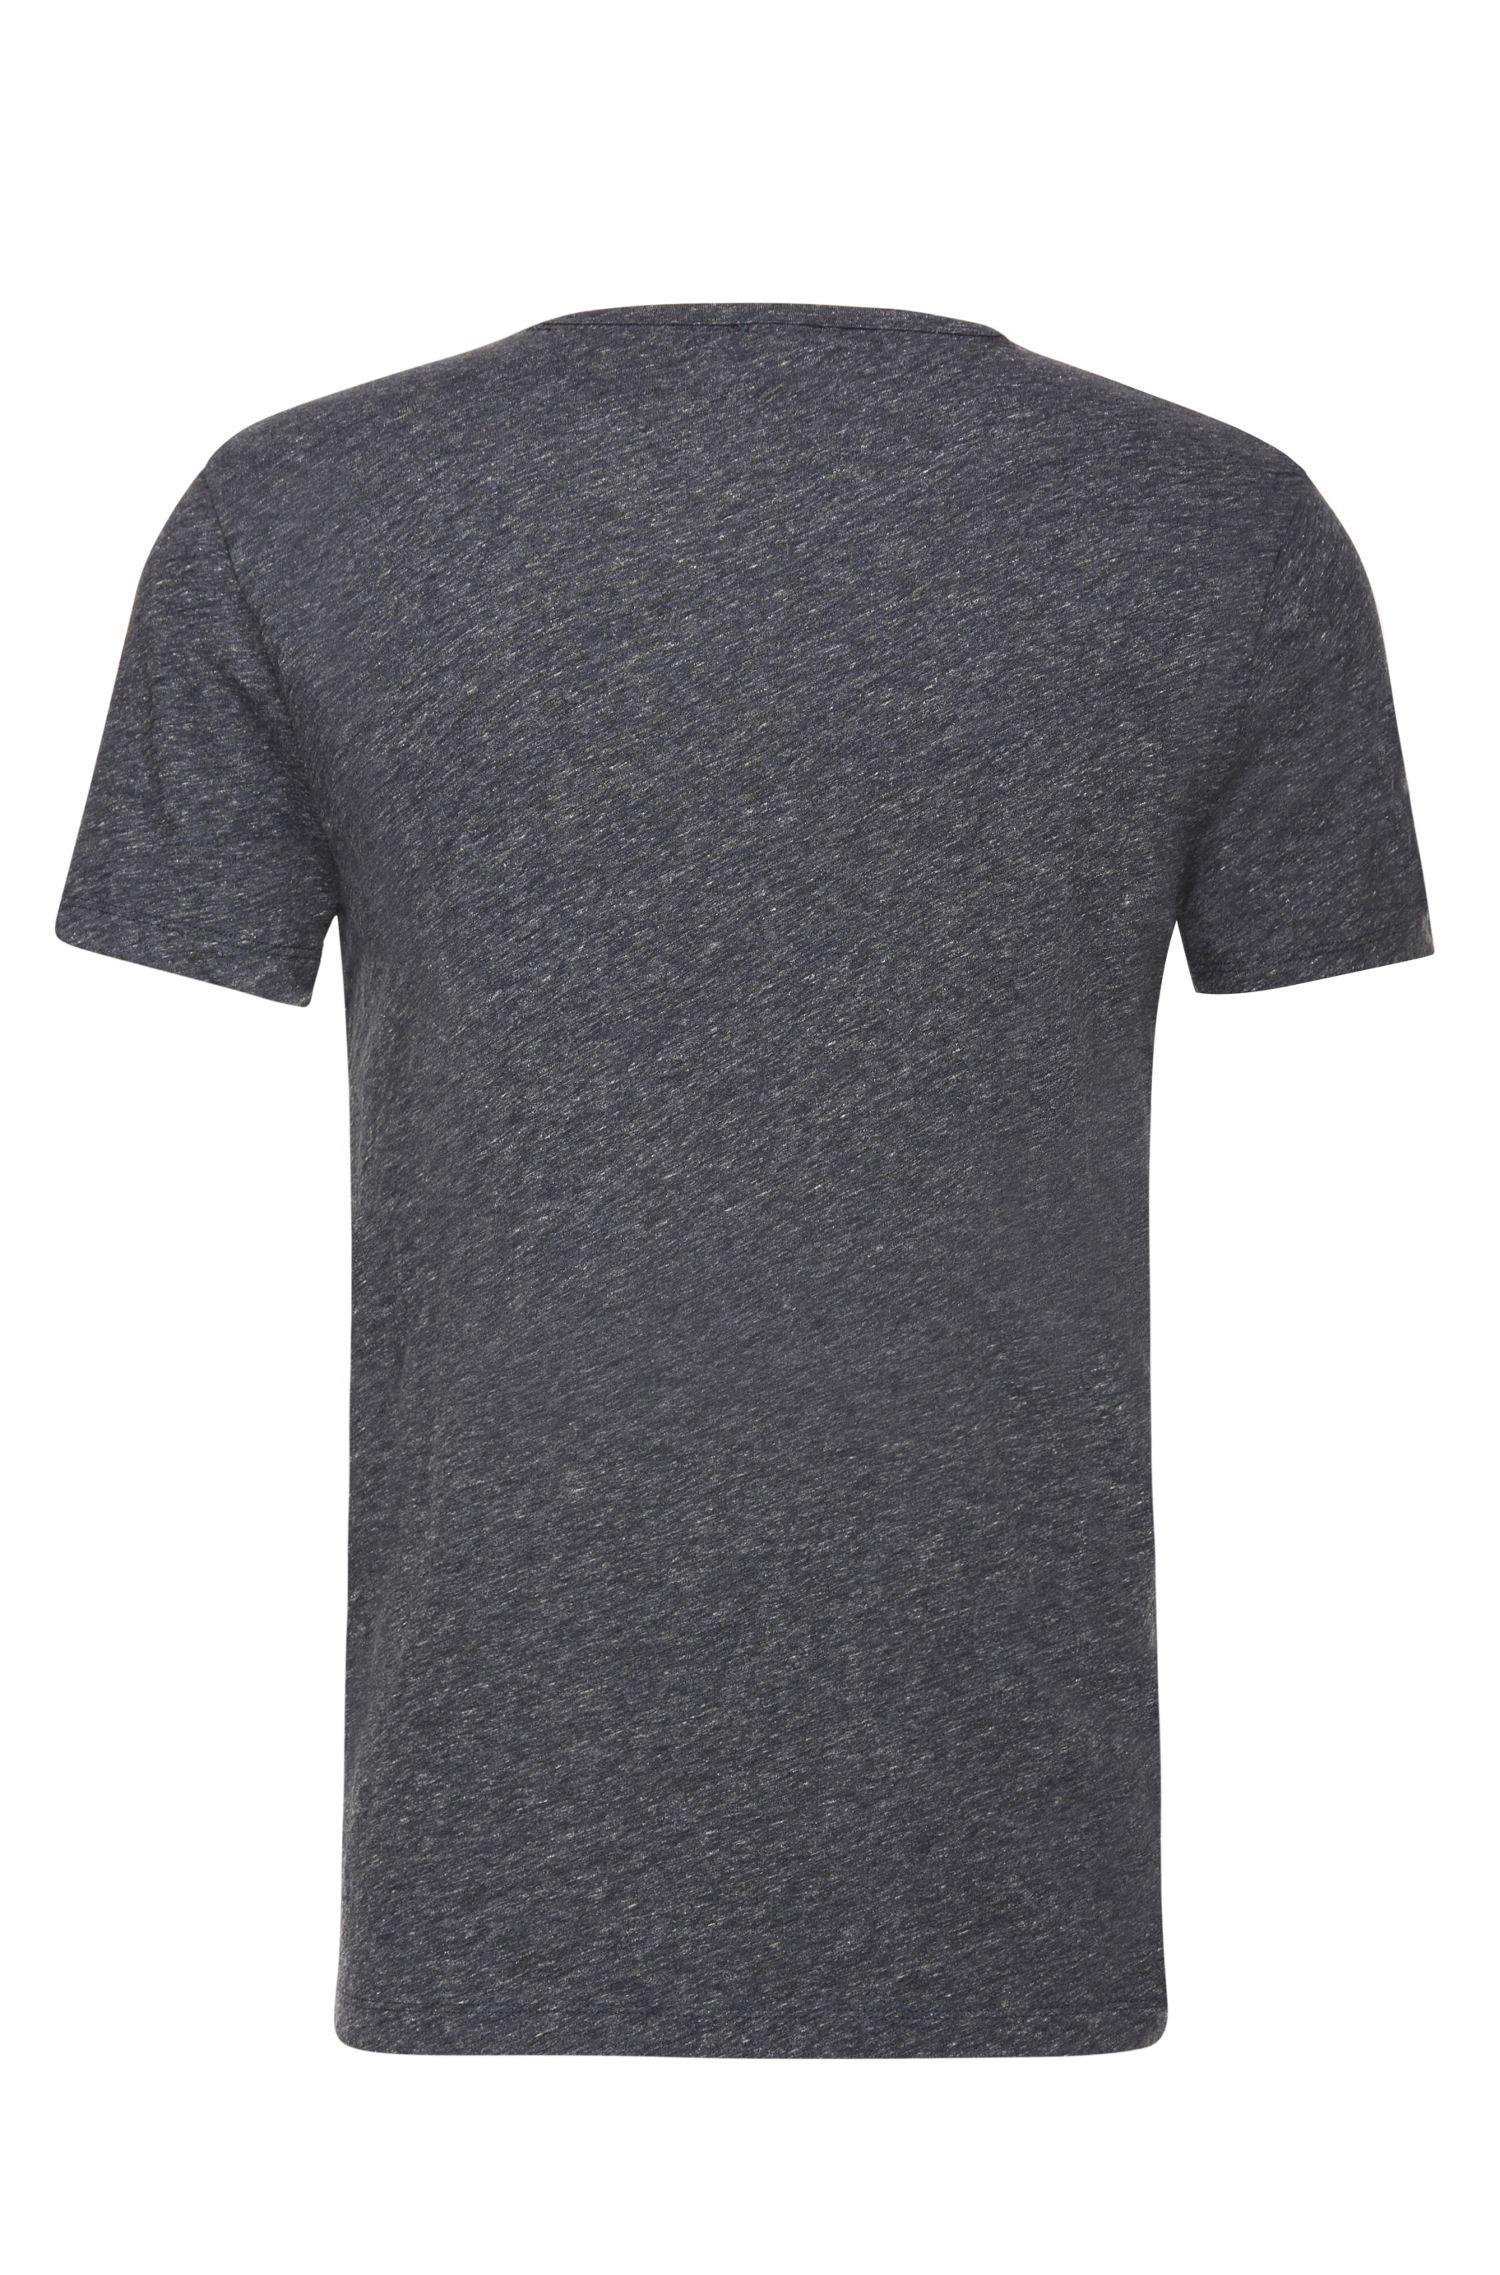 T-shirt Slim Fit en coton chiné: «Tabary»